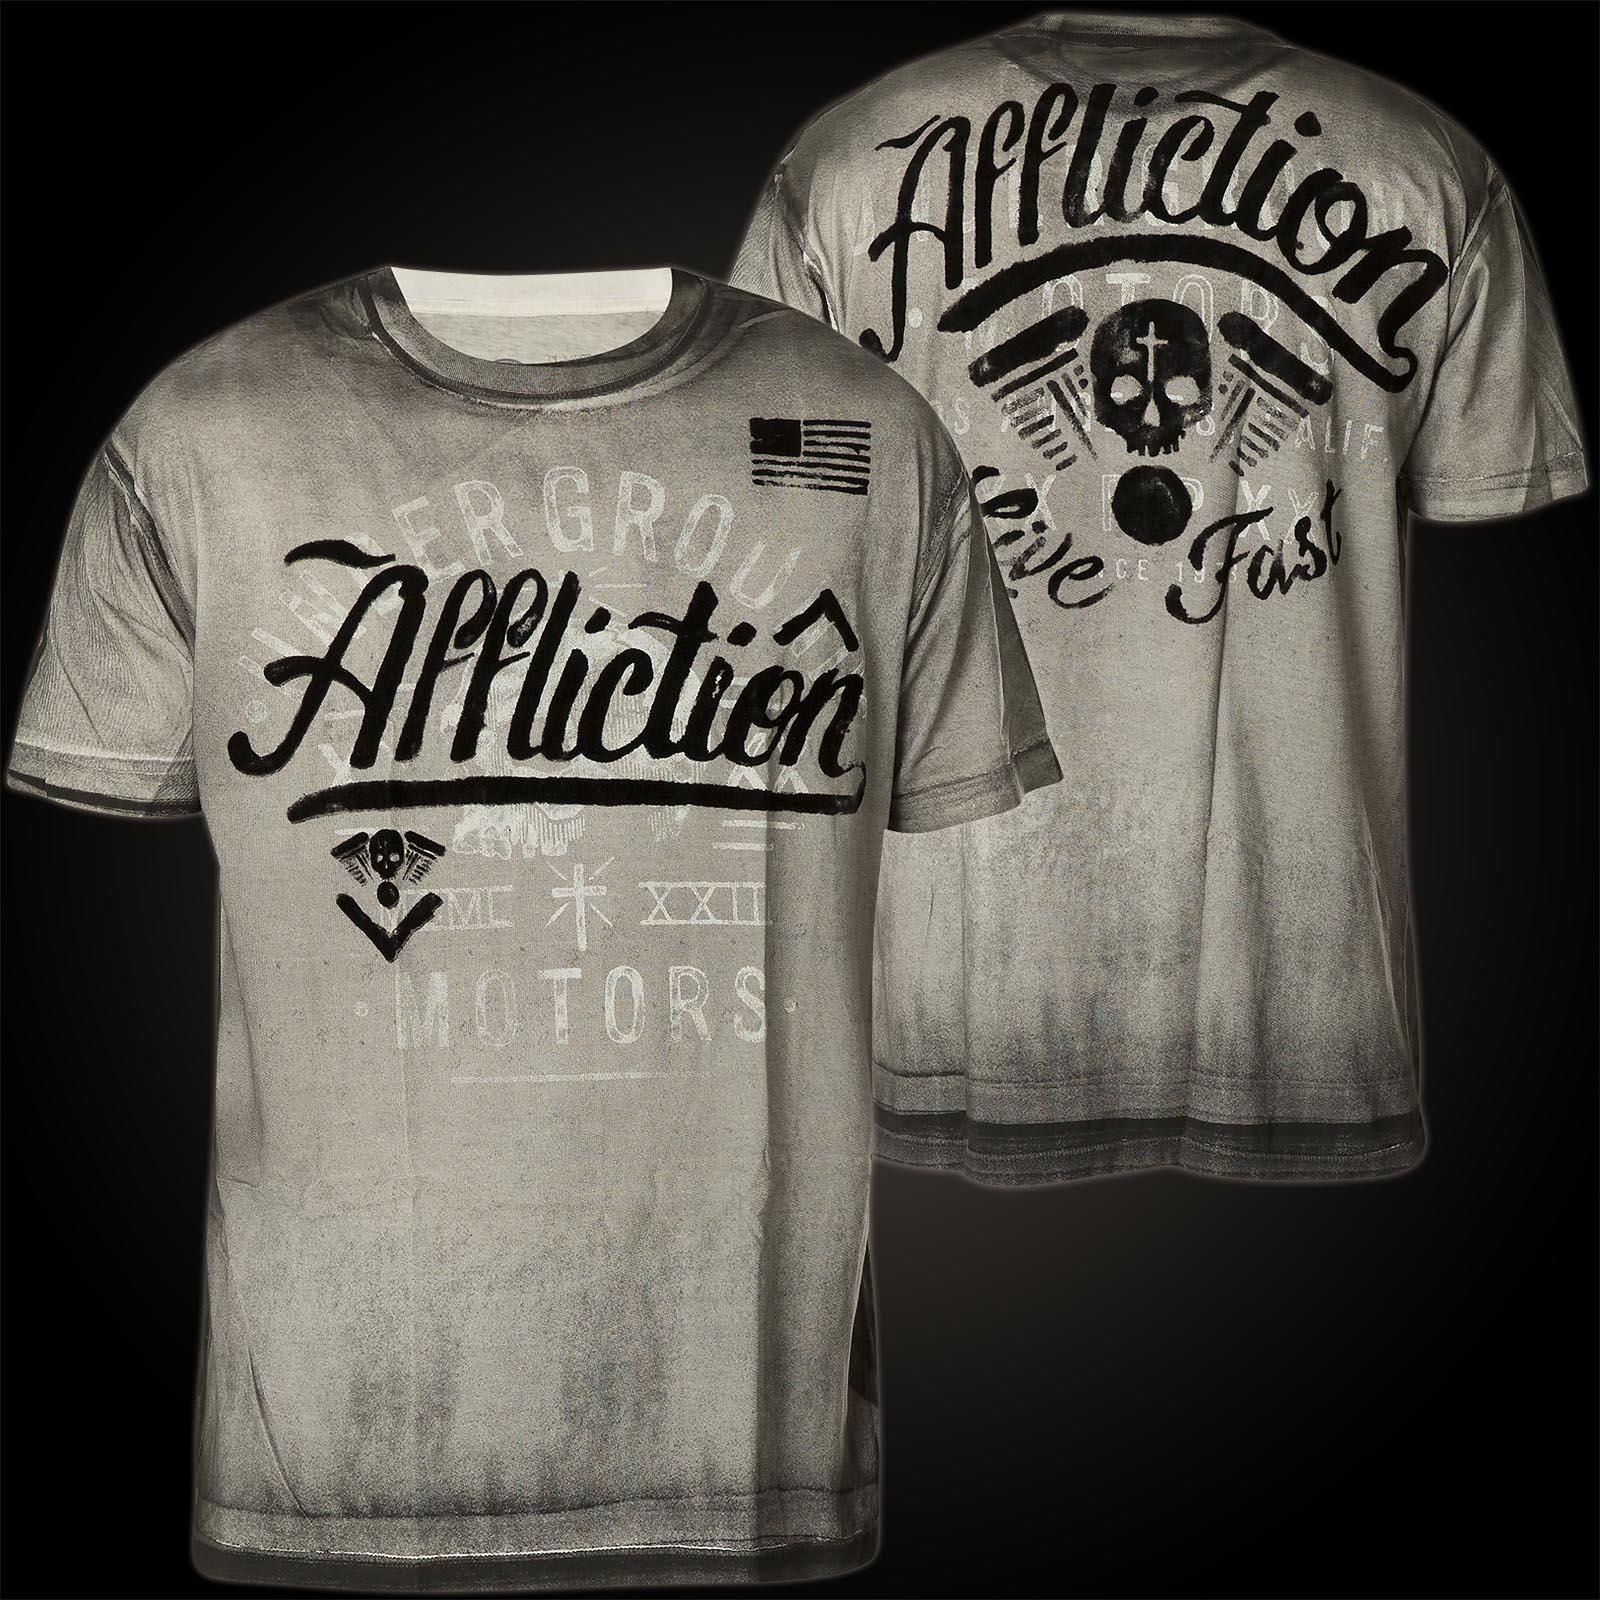 Affliction T Shirt Corpus Christi Ii Print Featuring A Skull